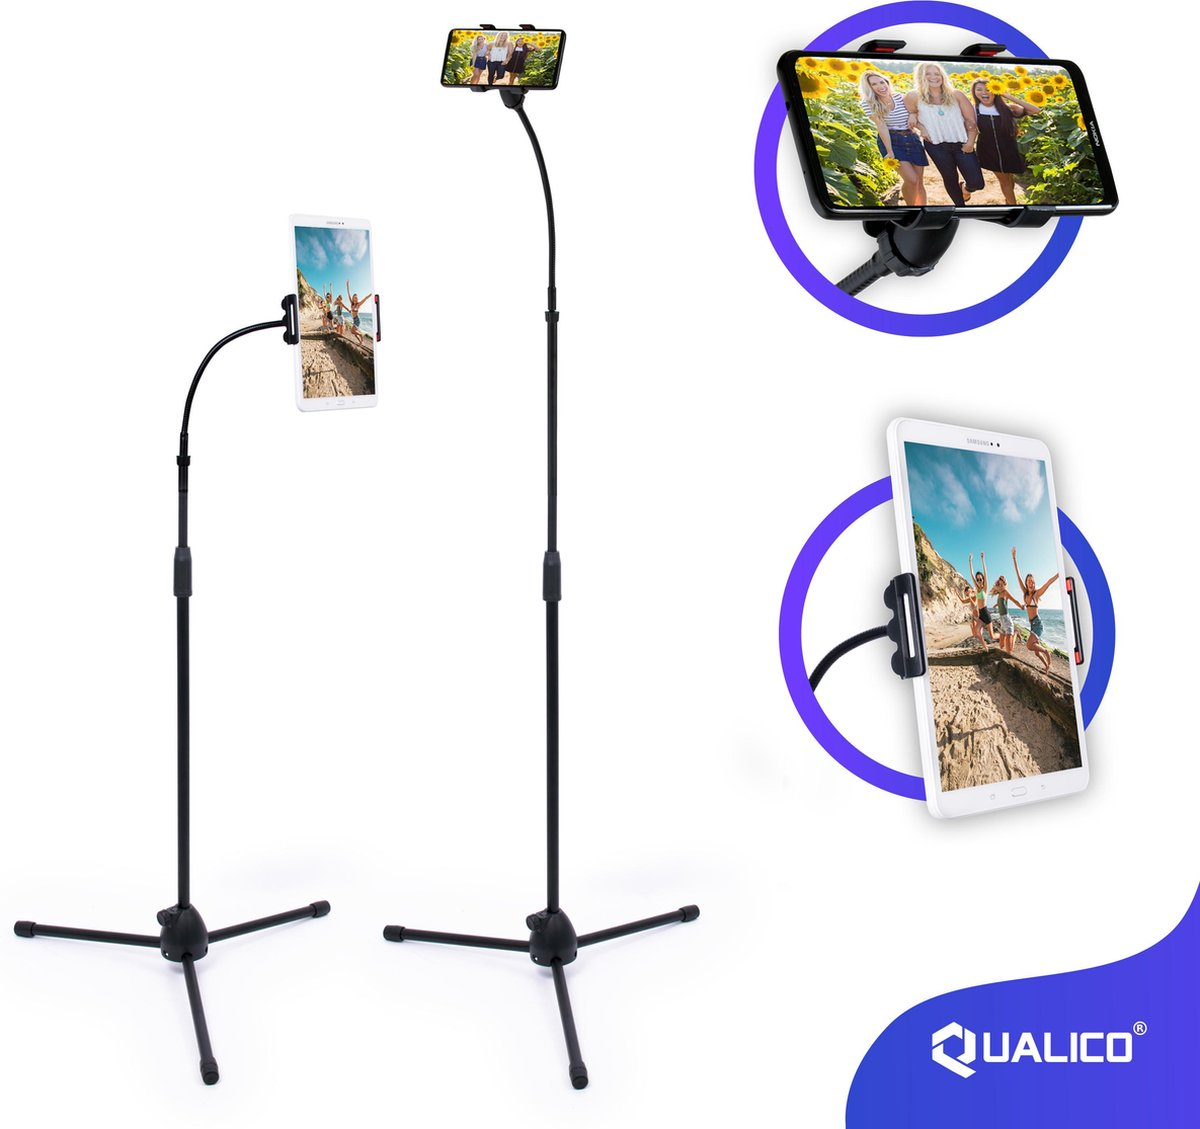 Universeel Tablet & Smartphone Statief Tot 175 cm Hoogte - Standaard Telefoon houder - Tripod & Staa